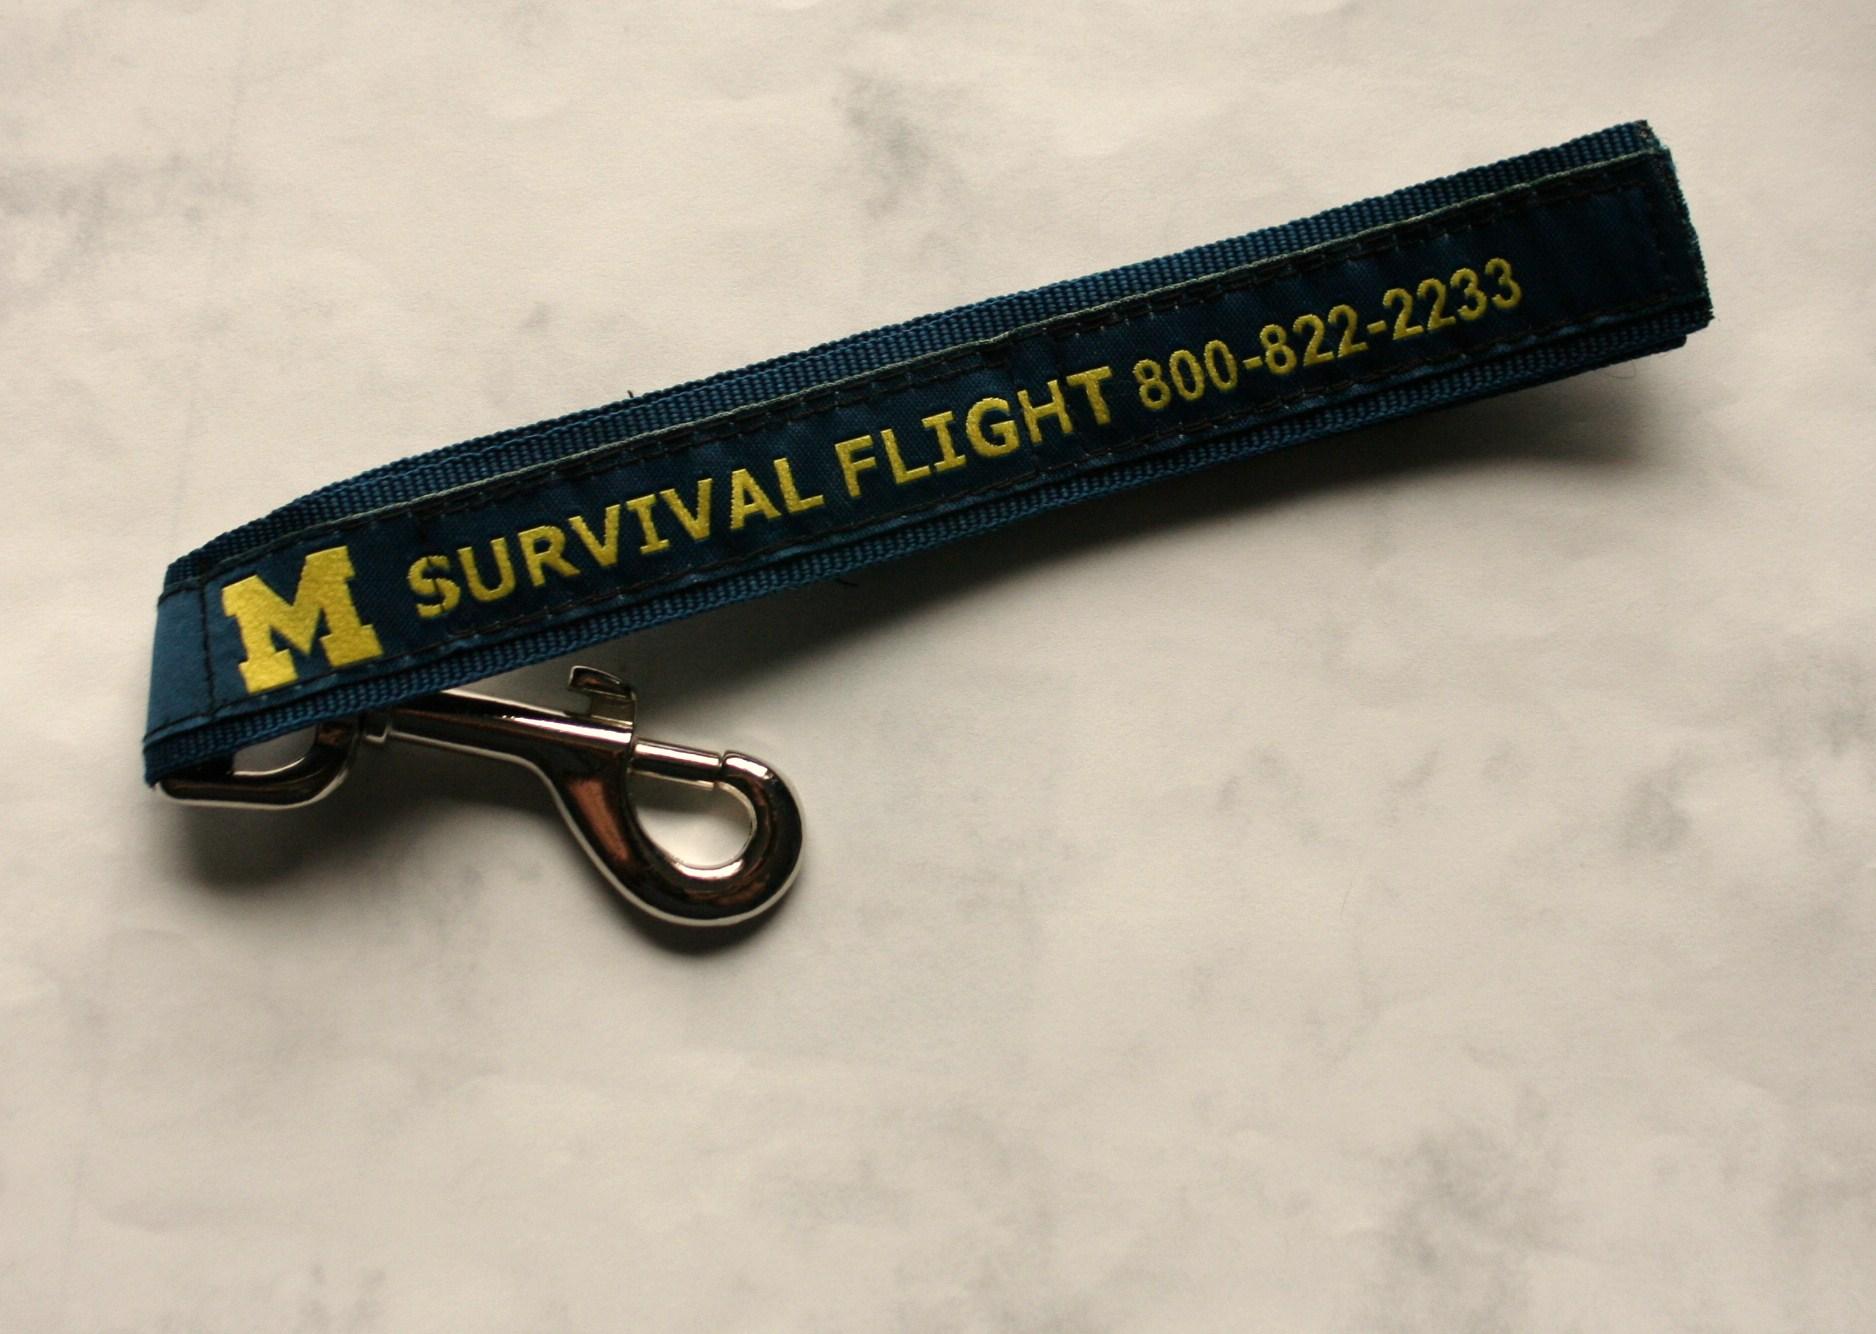 Survival Flight Key chain